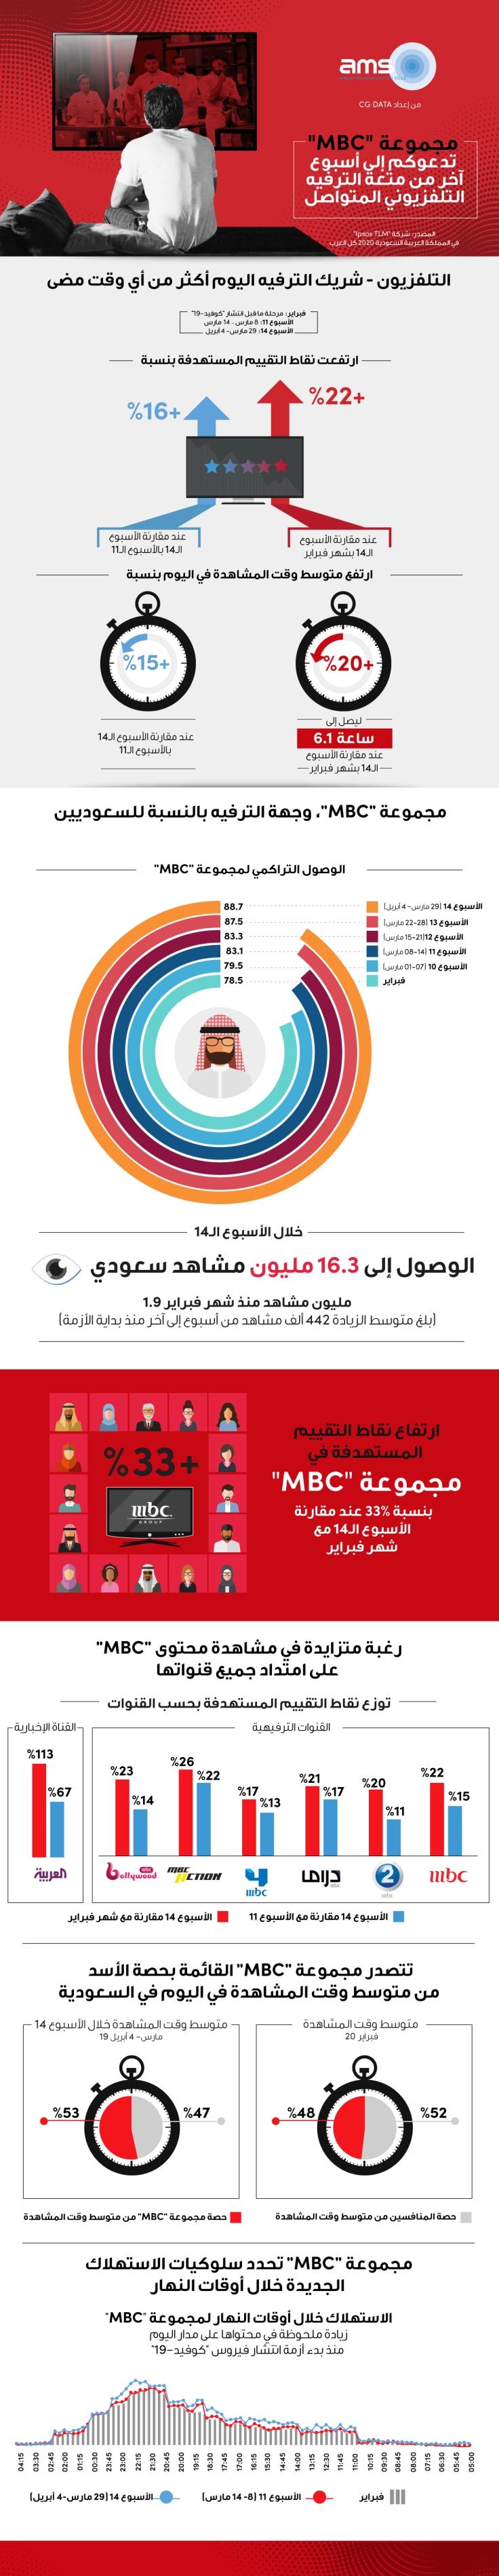 infographic-MBCTHREE_AR.JPG